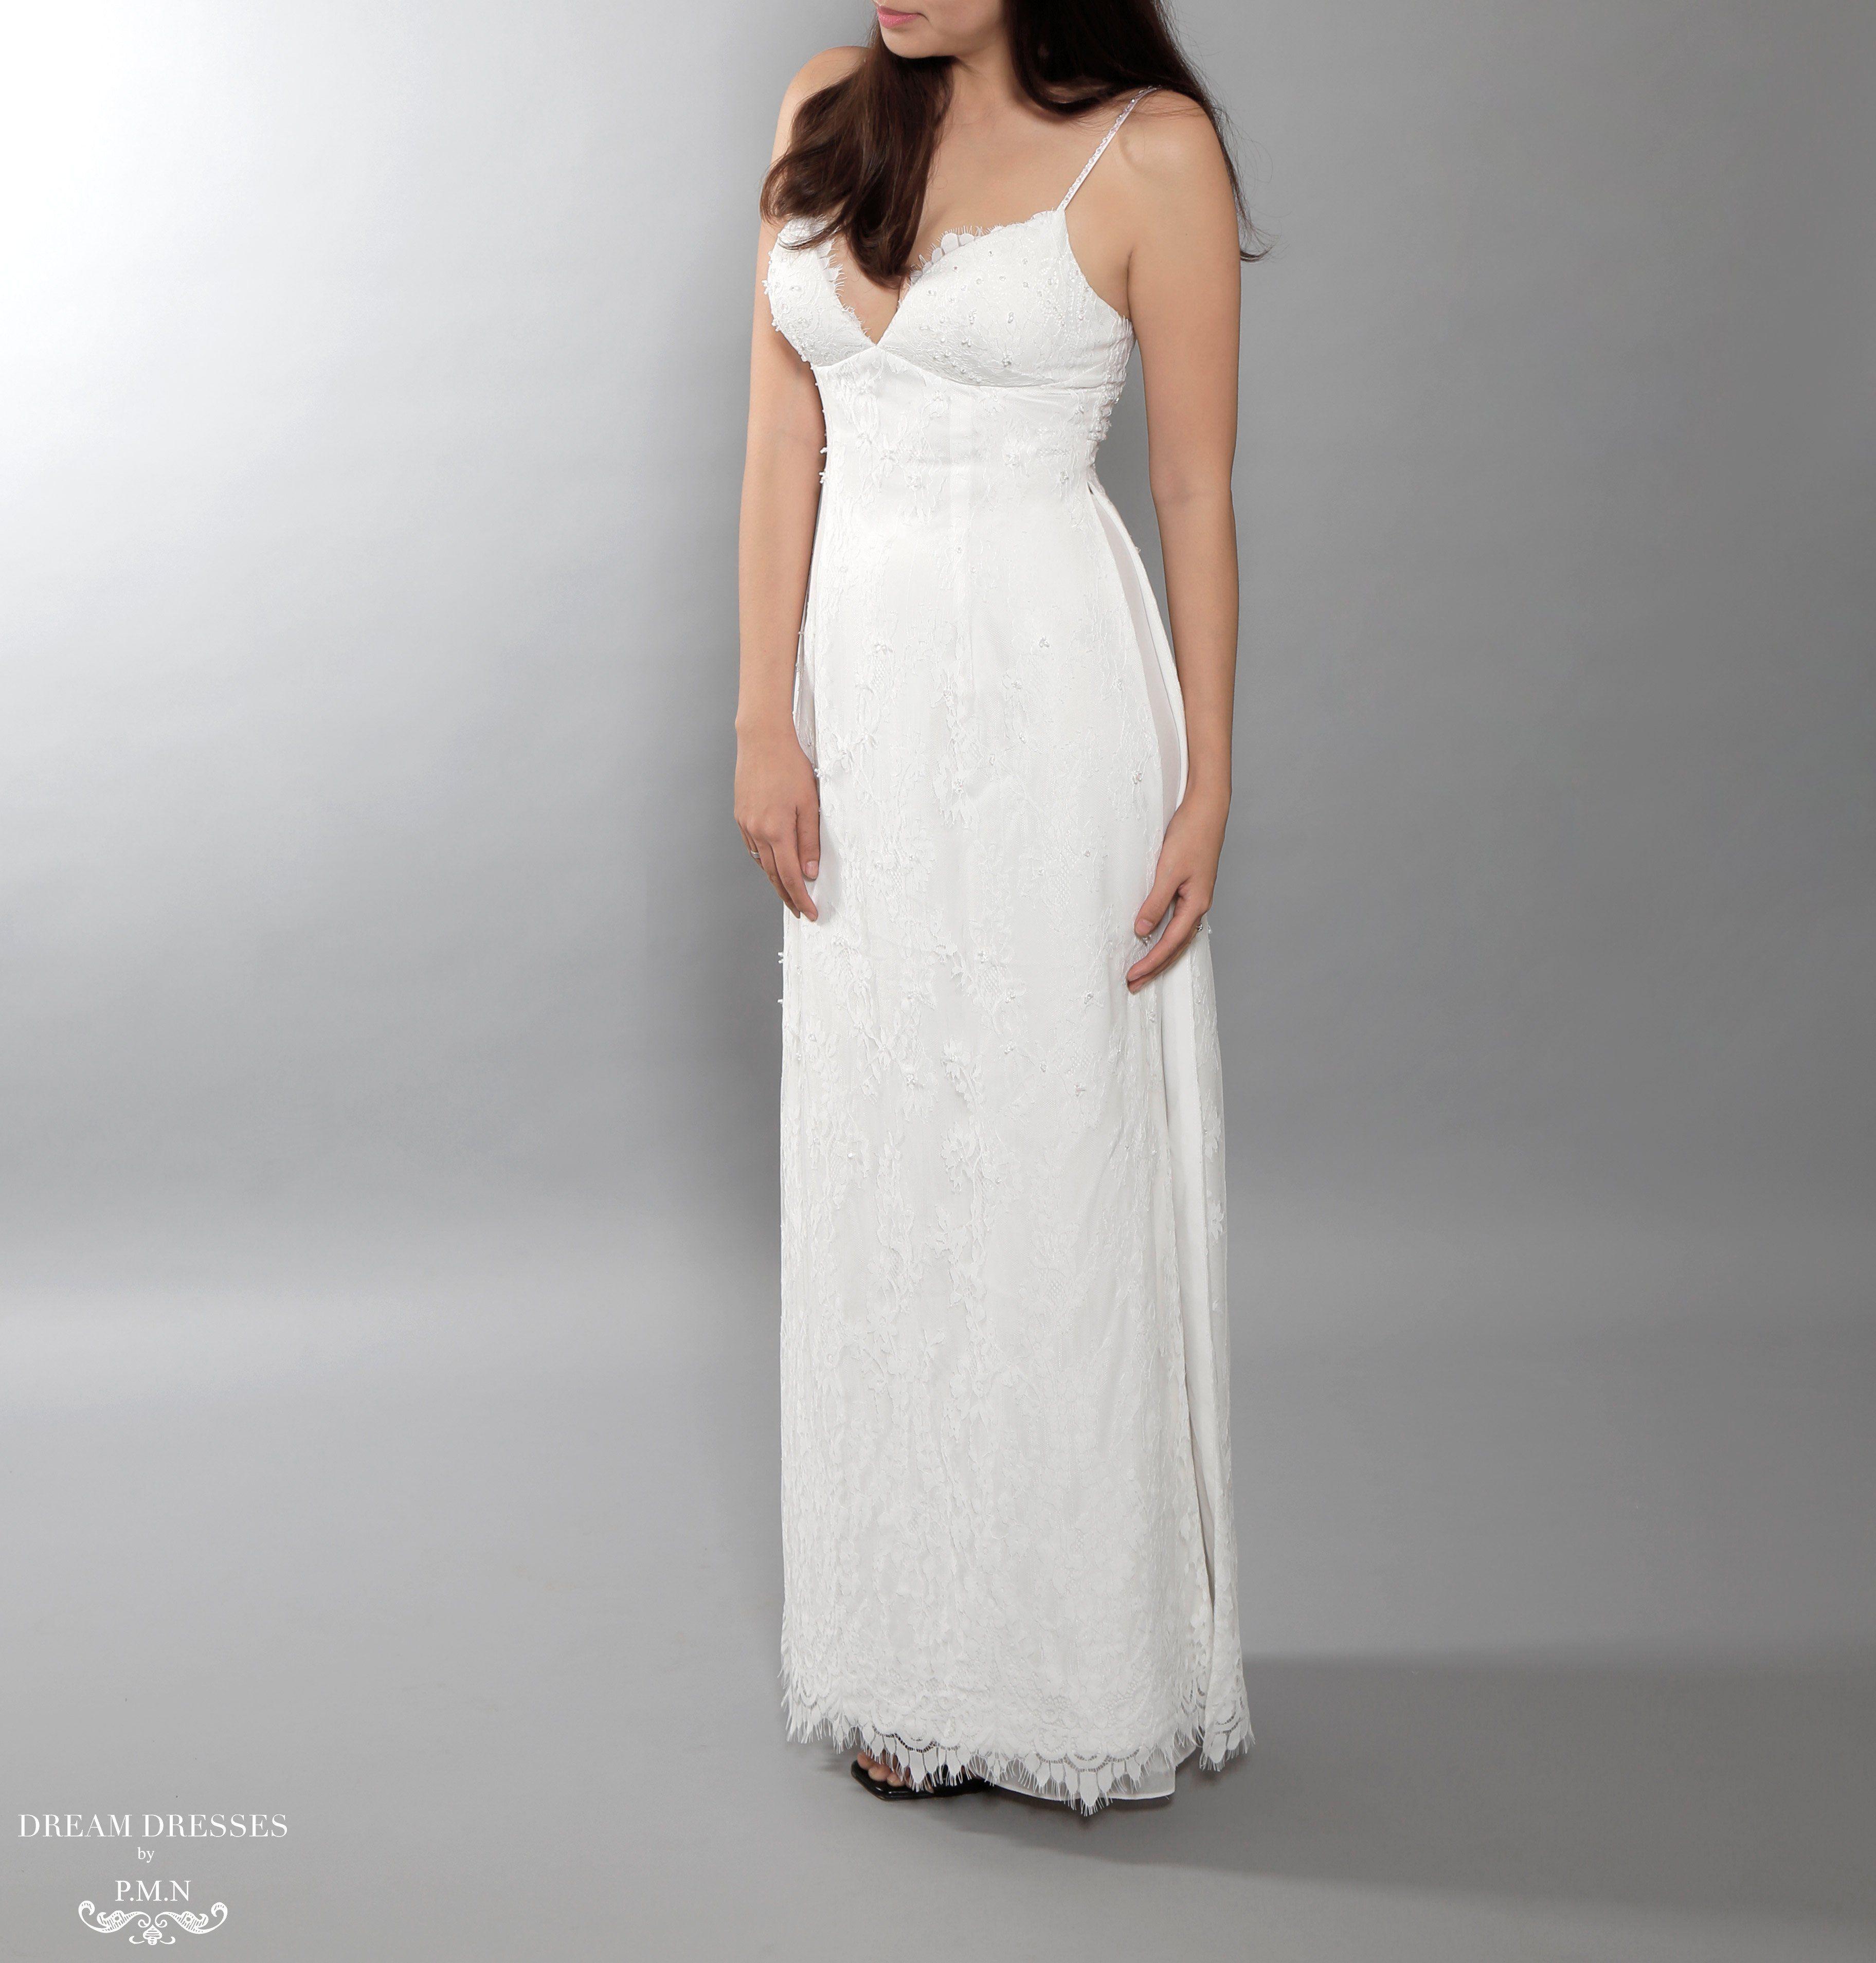 White Ao Dai | Vietnamese Lace Bridal Dress with Modern Neckline ...